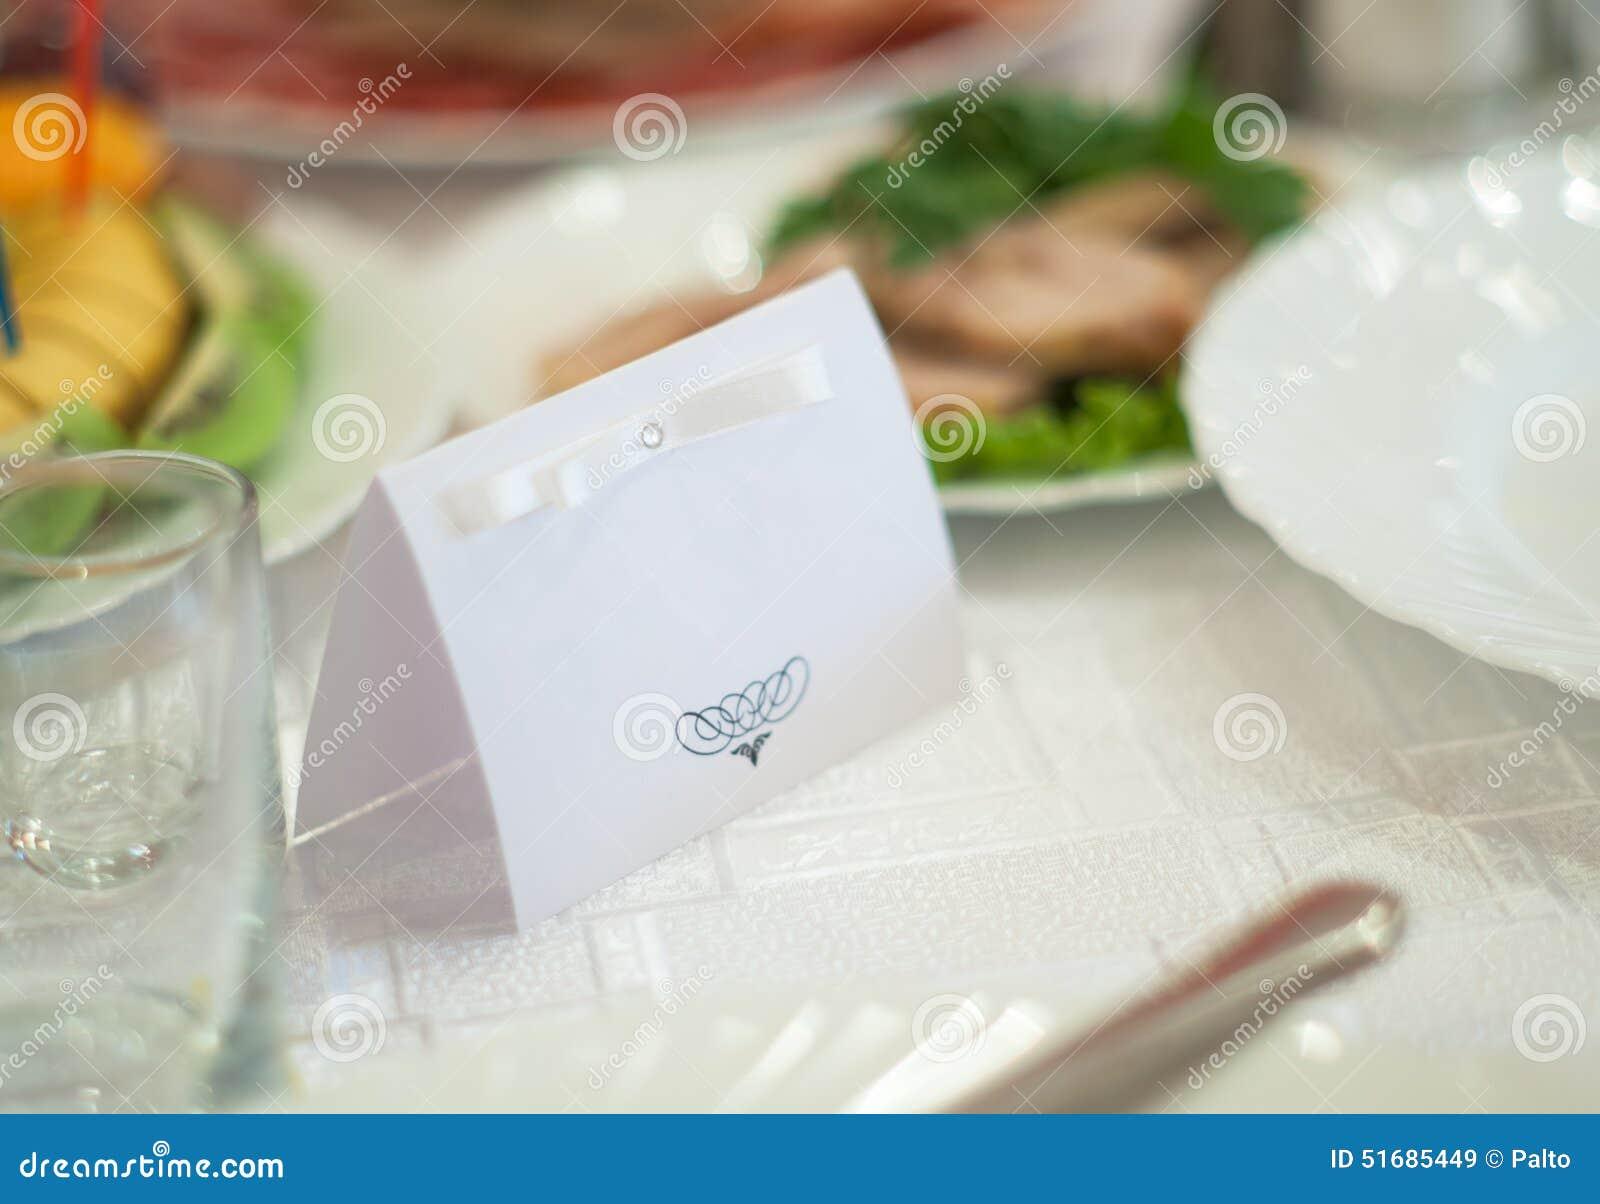 nameplate on wedding stock image image of insignia table 51685449